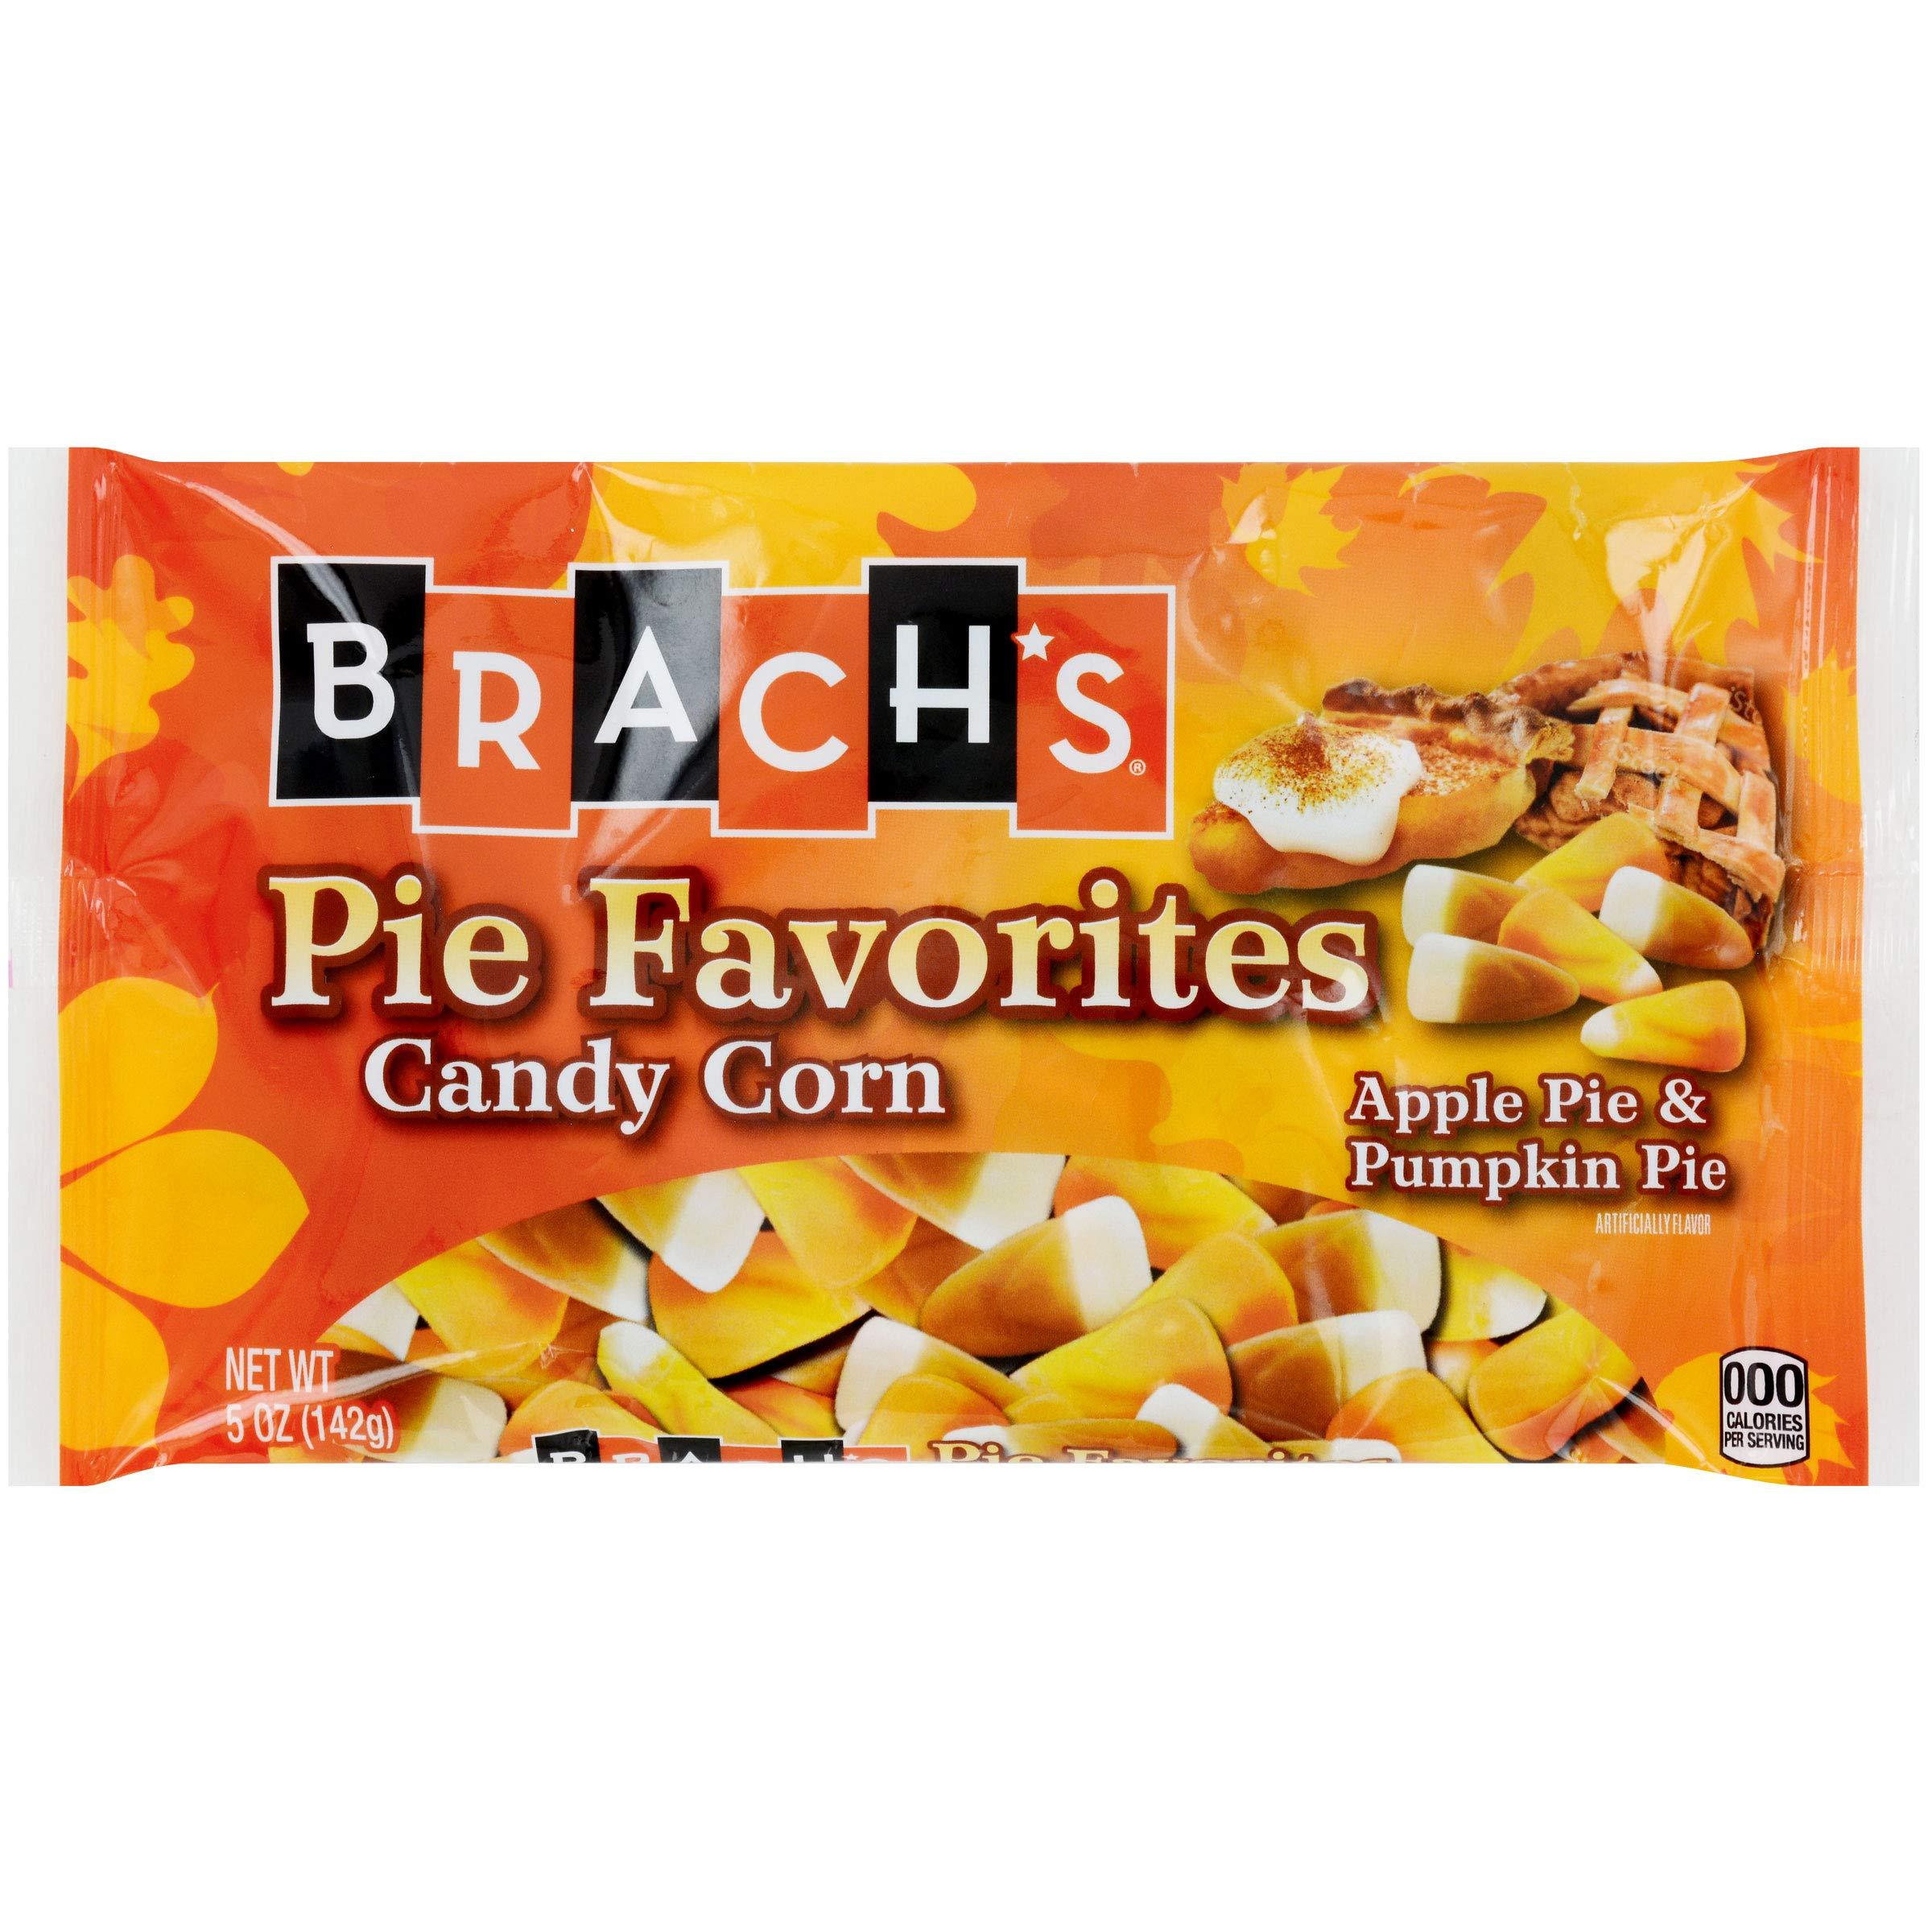 Brach's (1) bag Pie Favorites Candy Corn - Apple Pie & Pumpkin Pie Flavored Halloween/Fall Candy - Net Wt. 5 oz